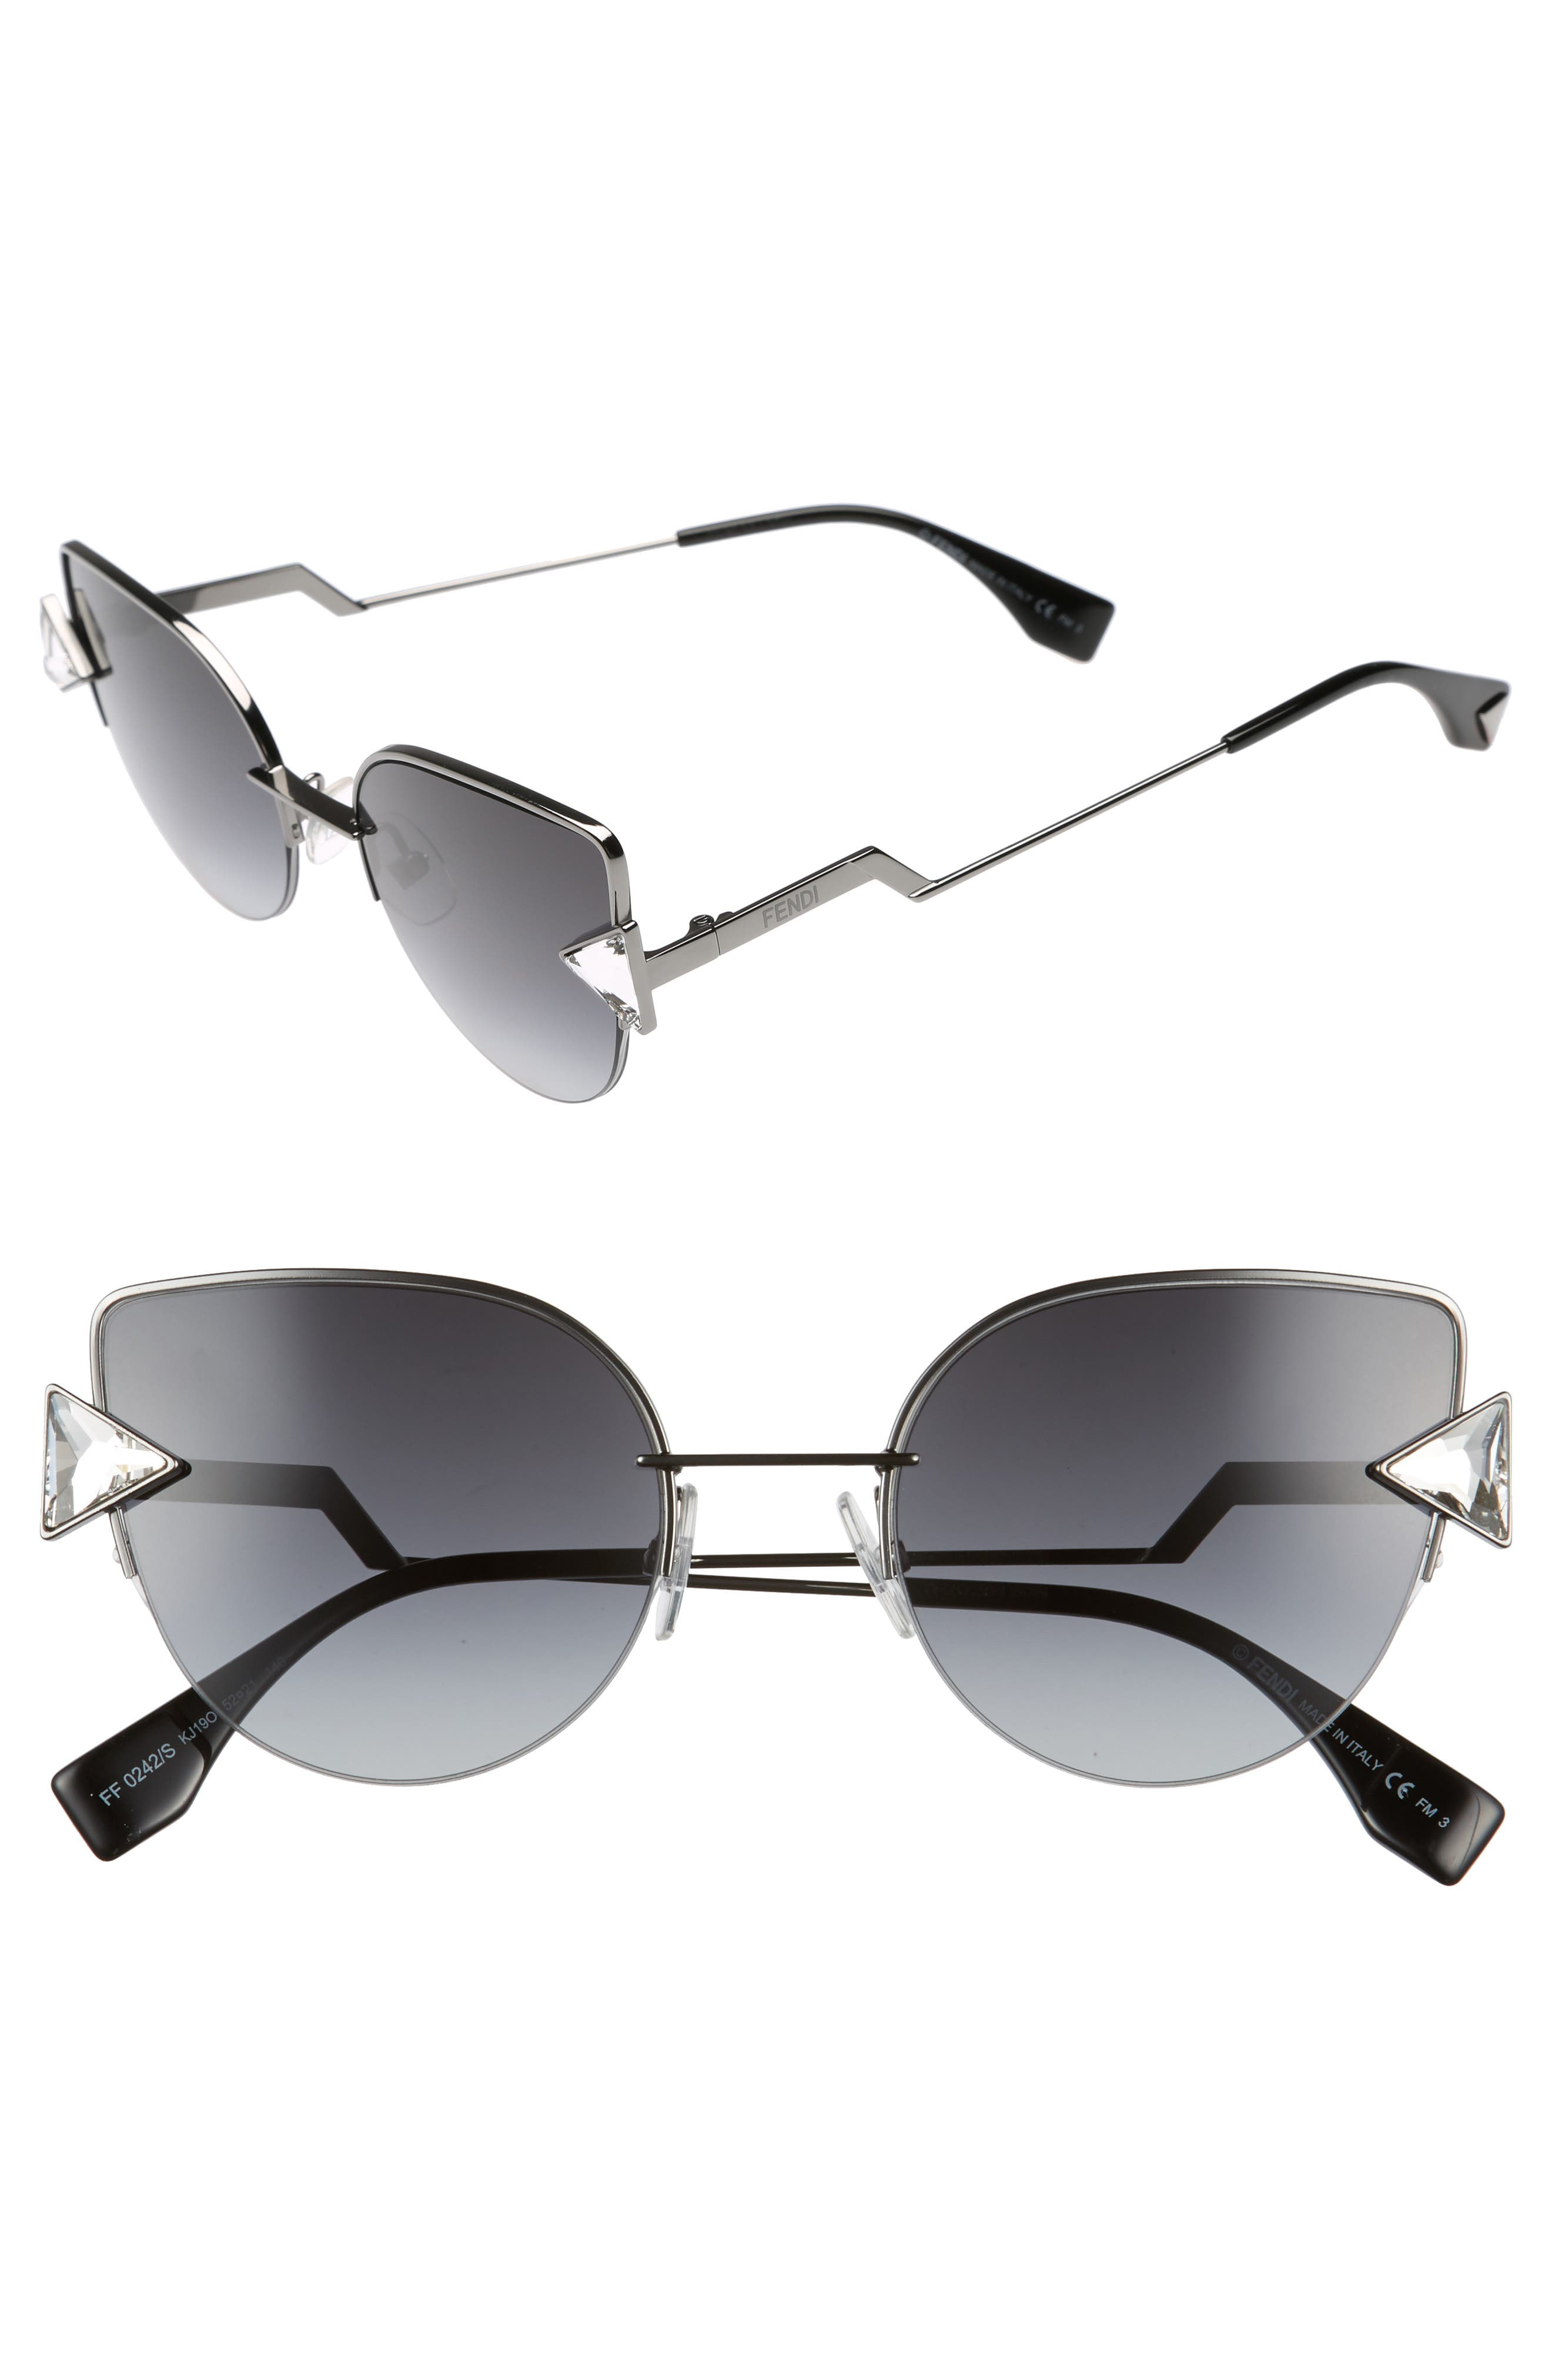 Rainbow 52mm Semi-Rimless Sunglasses,                             Main thumbnail 1, color,                             040